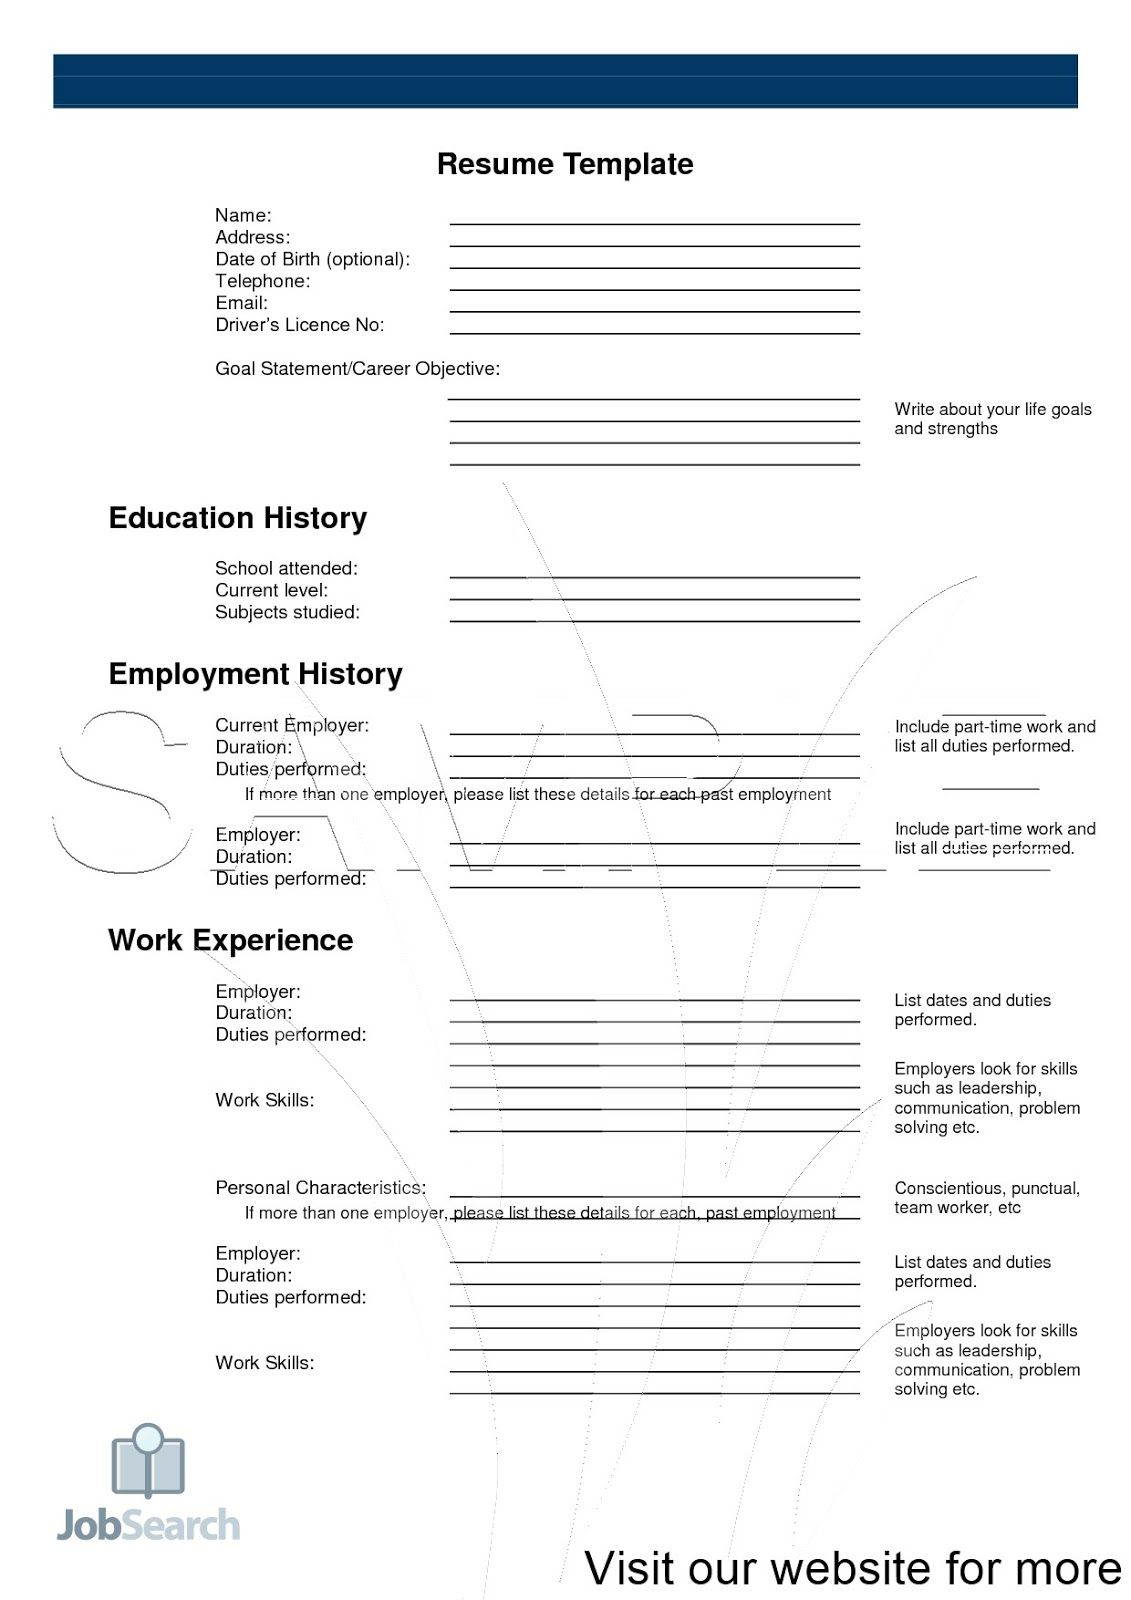 Resume Template 2020 Cv Template Free Job Resume Template Retail Resume Examples